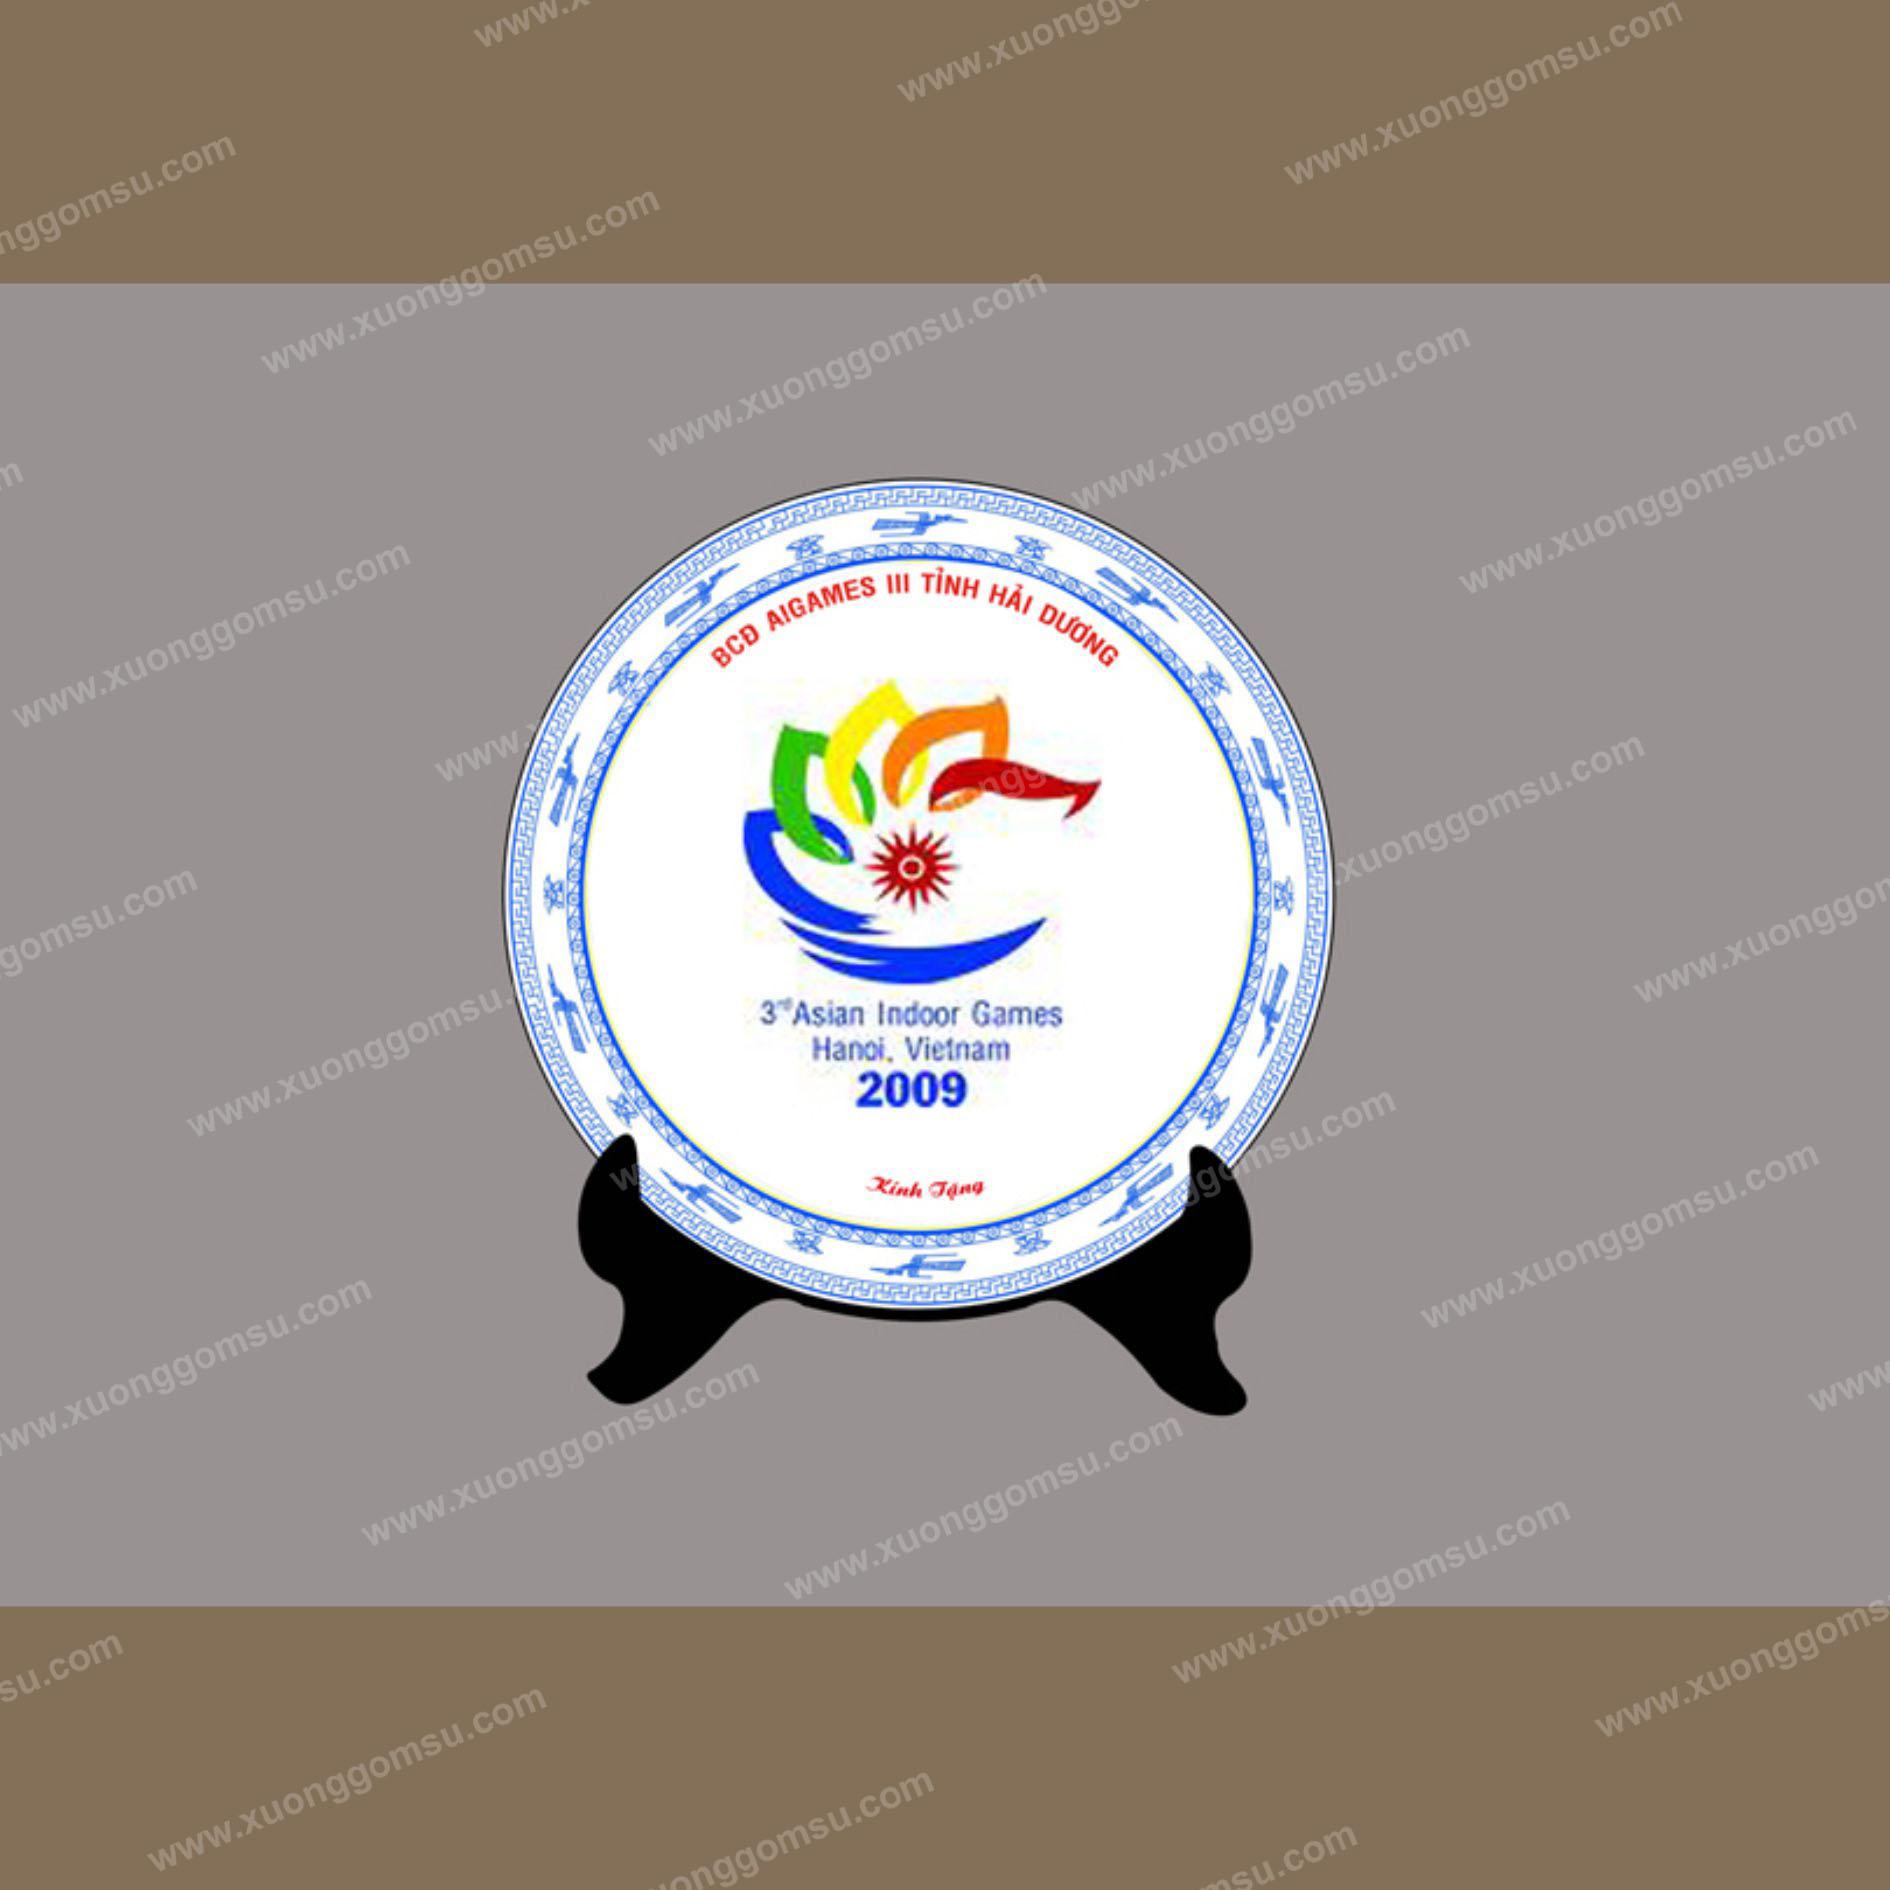 đĩa in logo